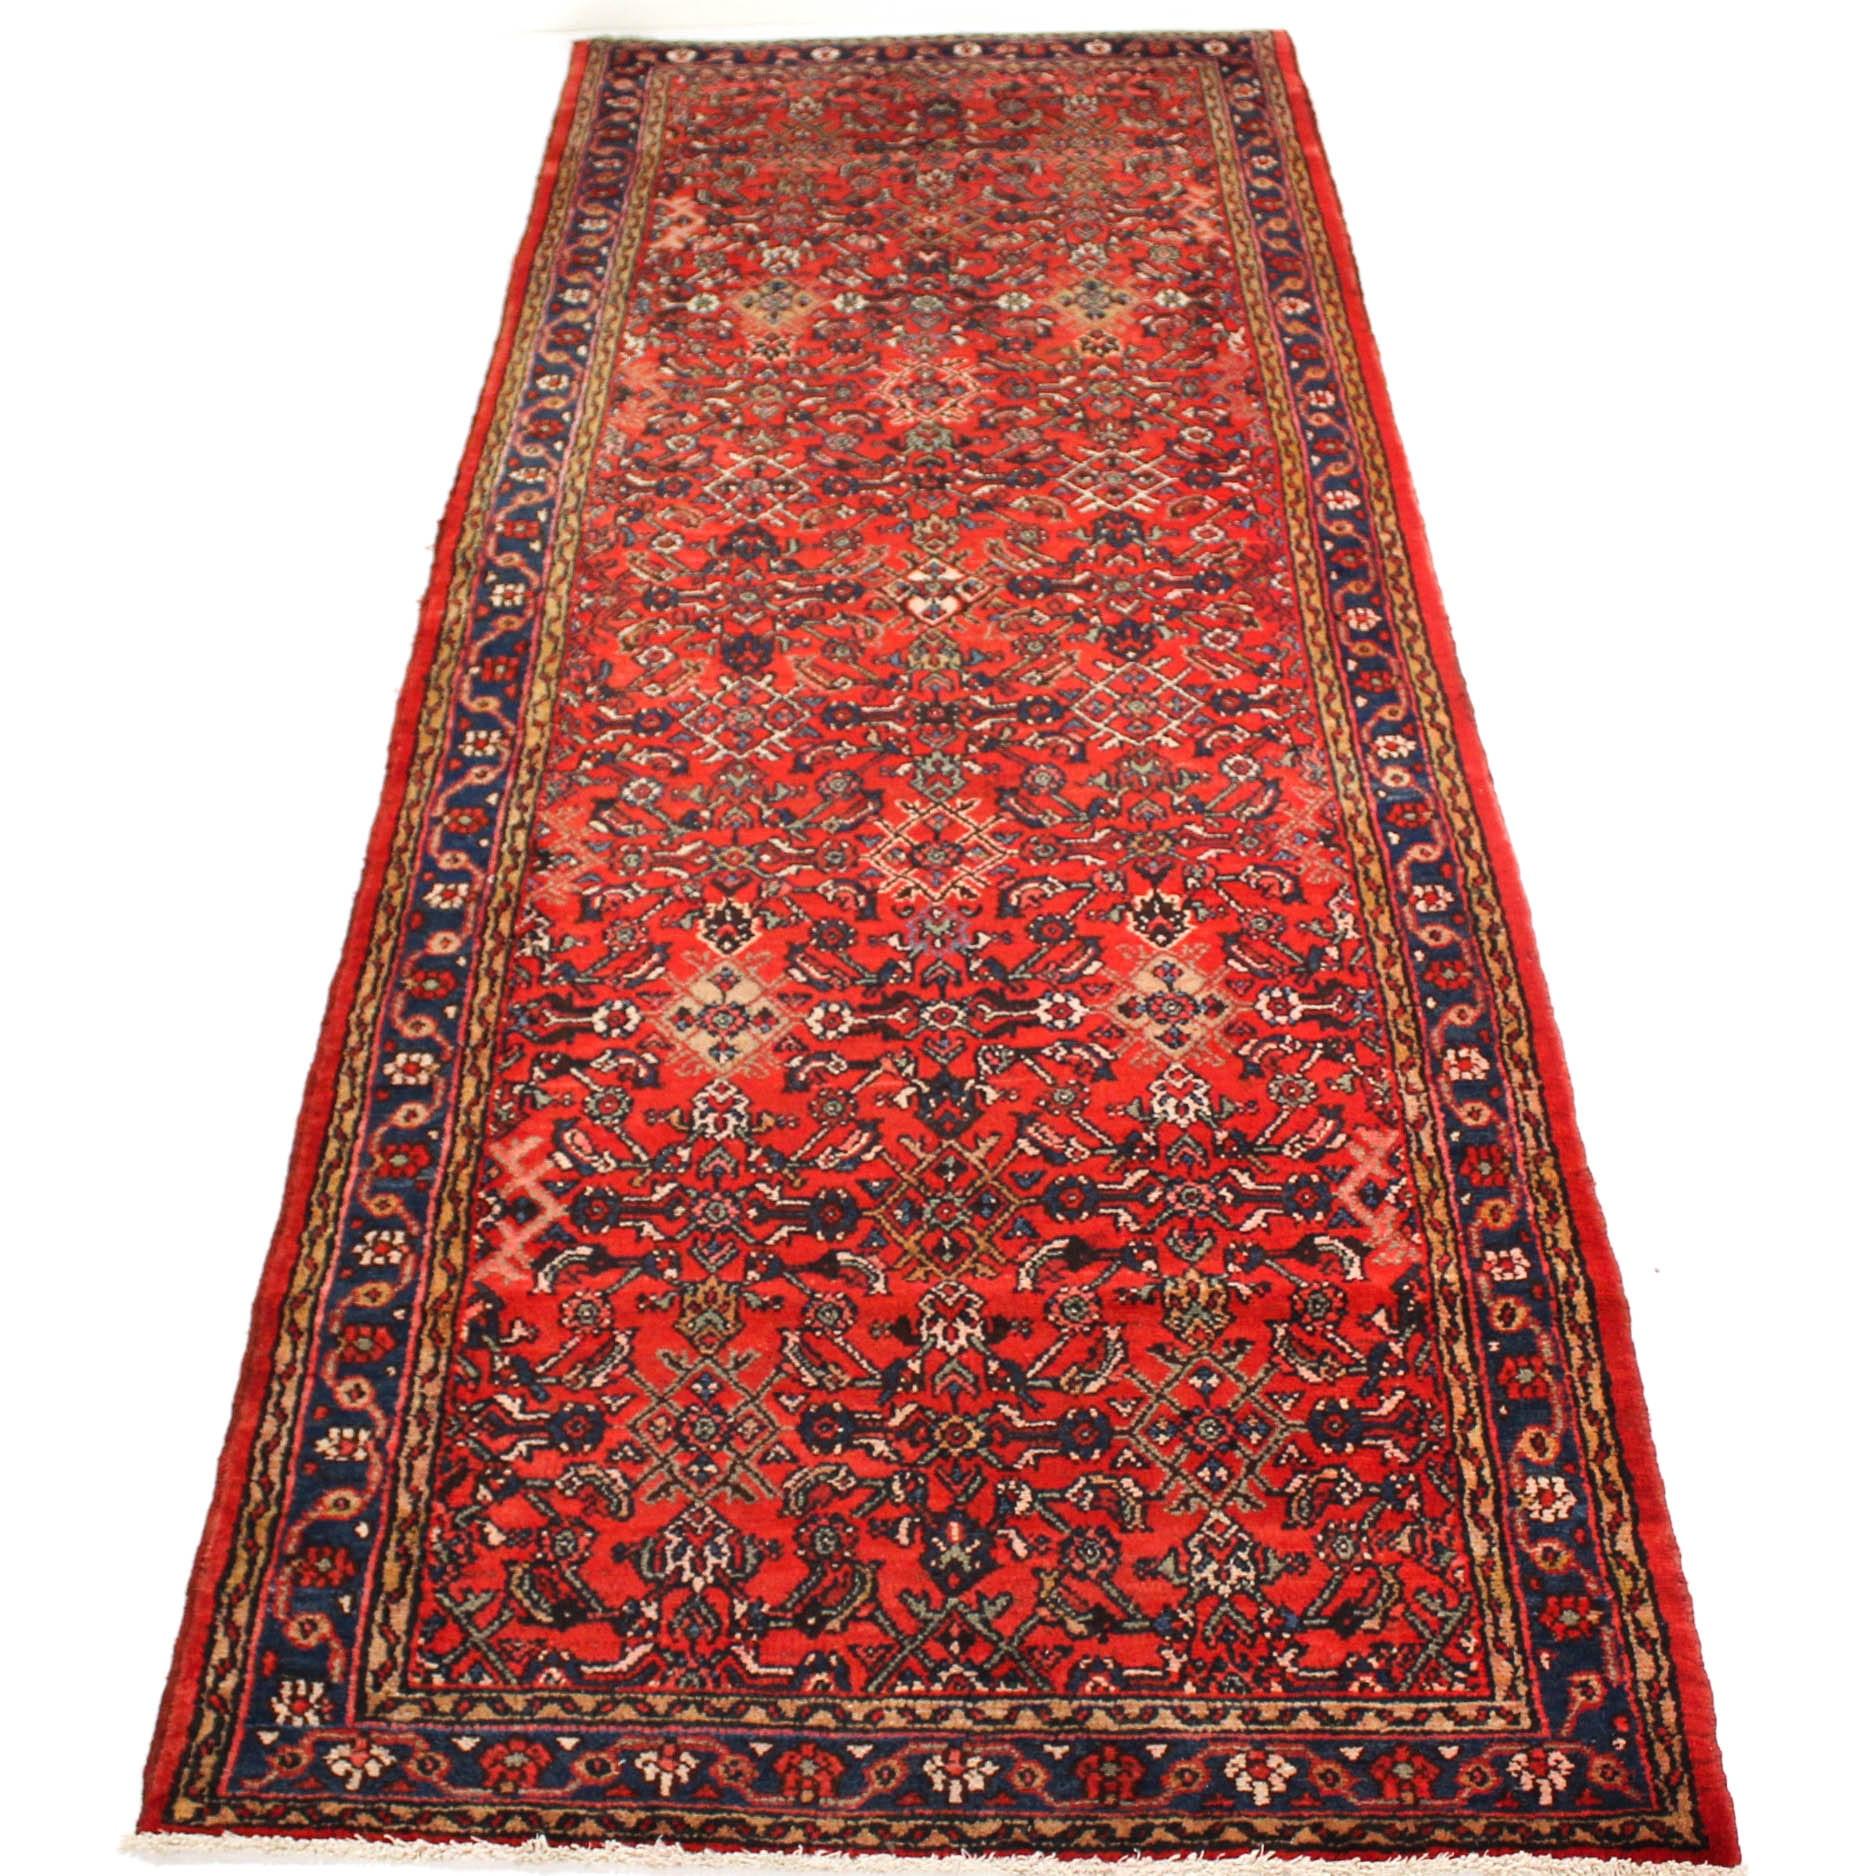 4'1 x 11'8 Hand-Knotted Semi-Antique Persian Zanjan Carpet Runner